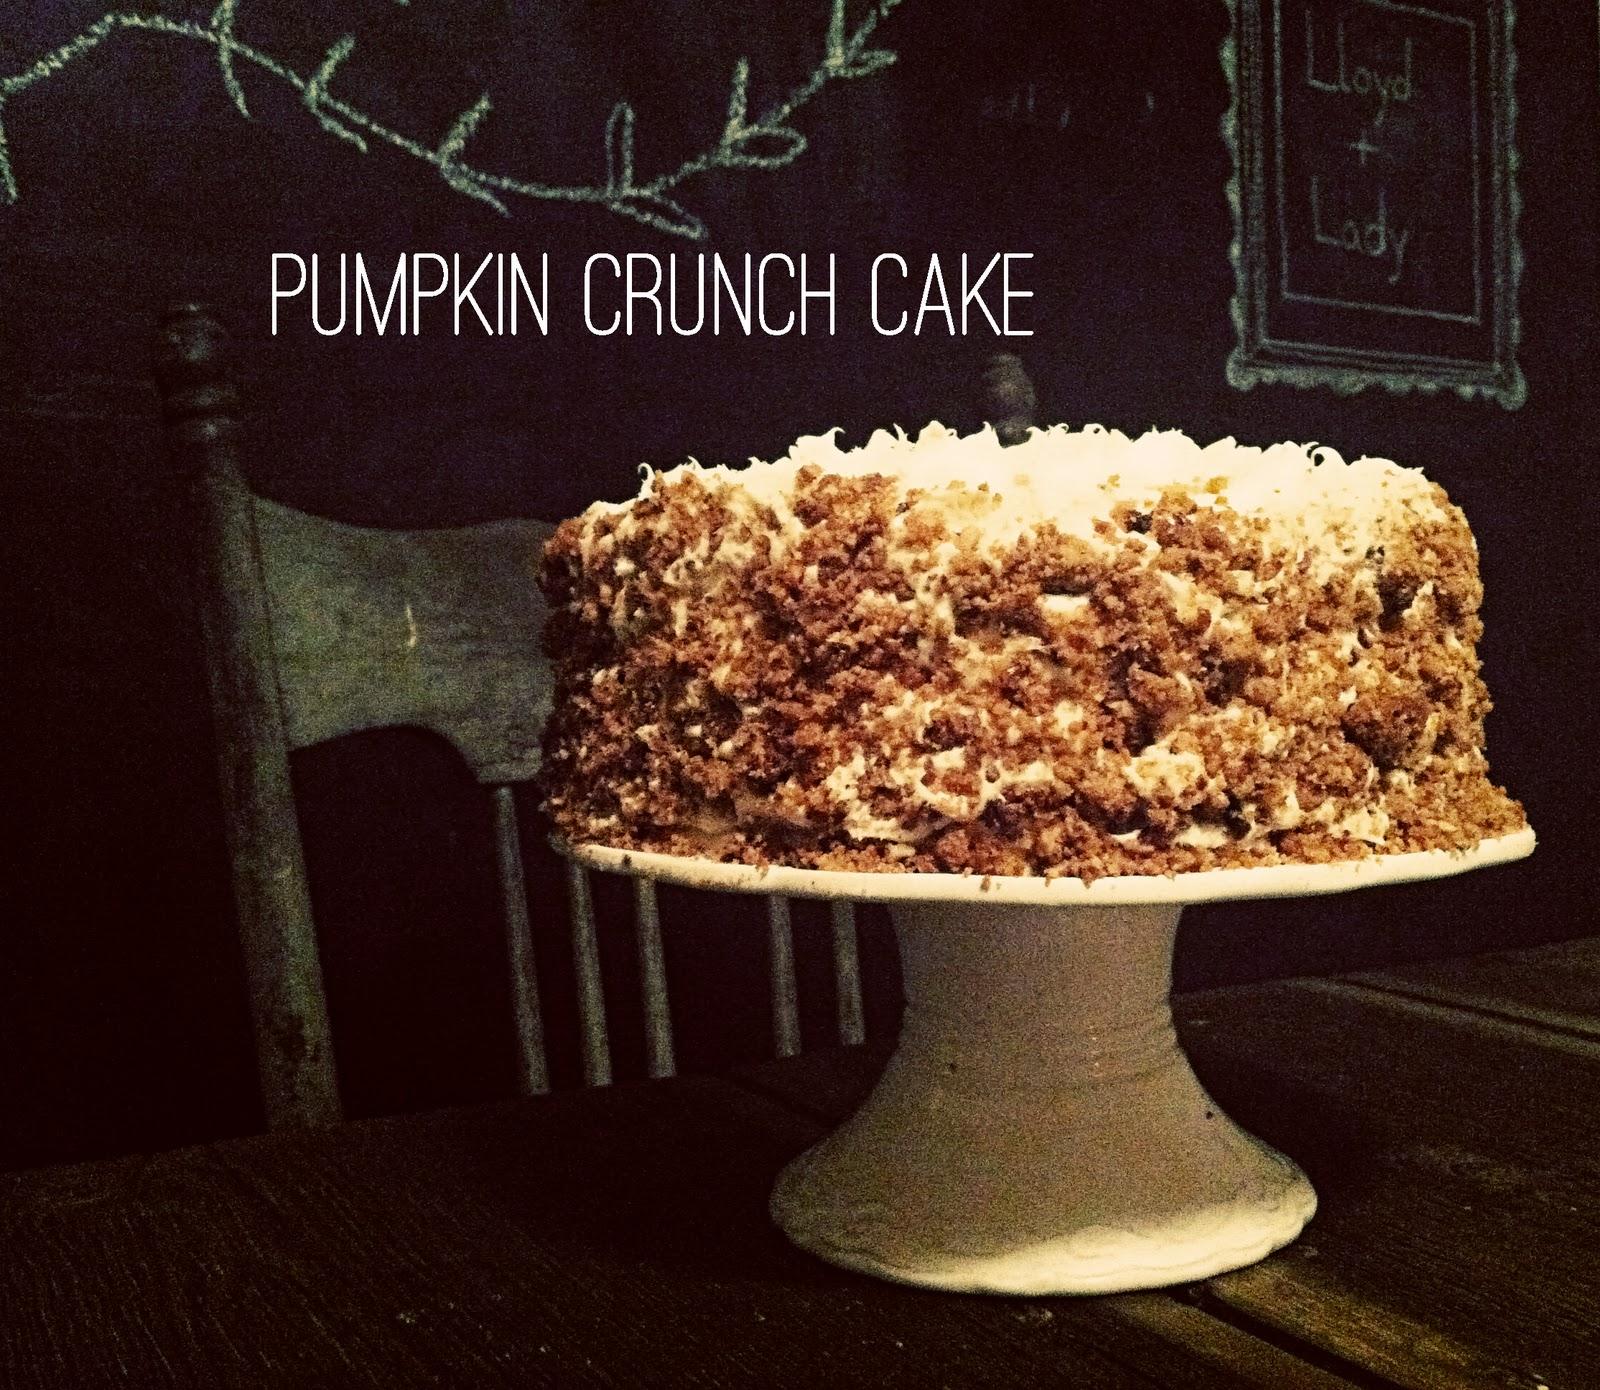 Inspired Kara: Pumpkin Crunch Cake